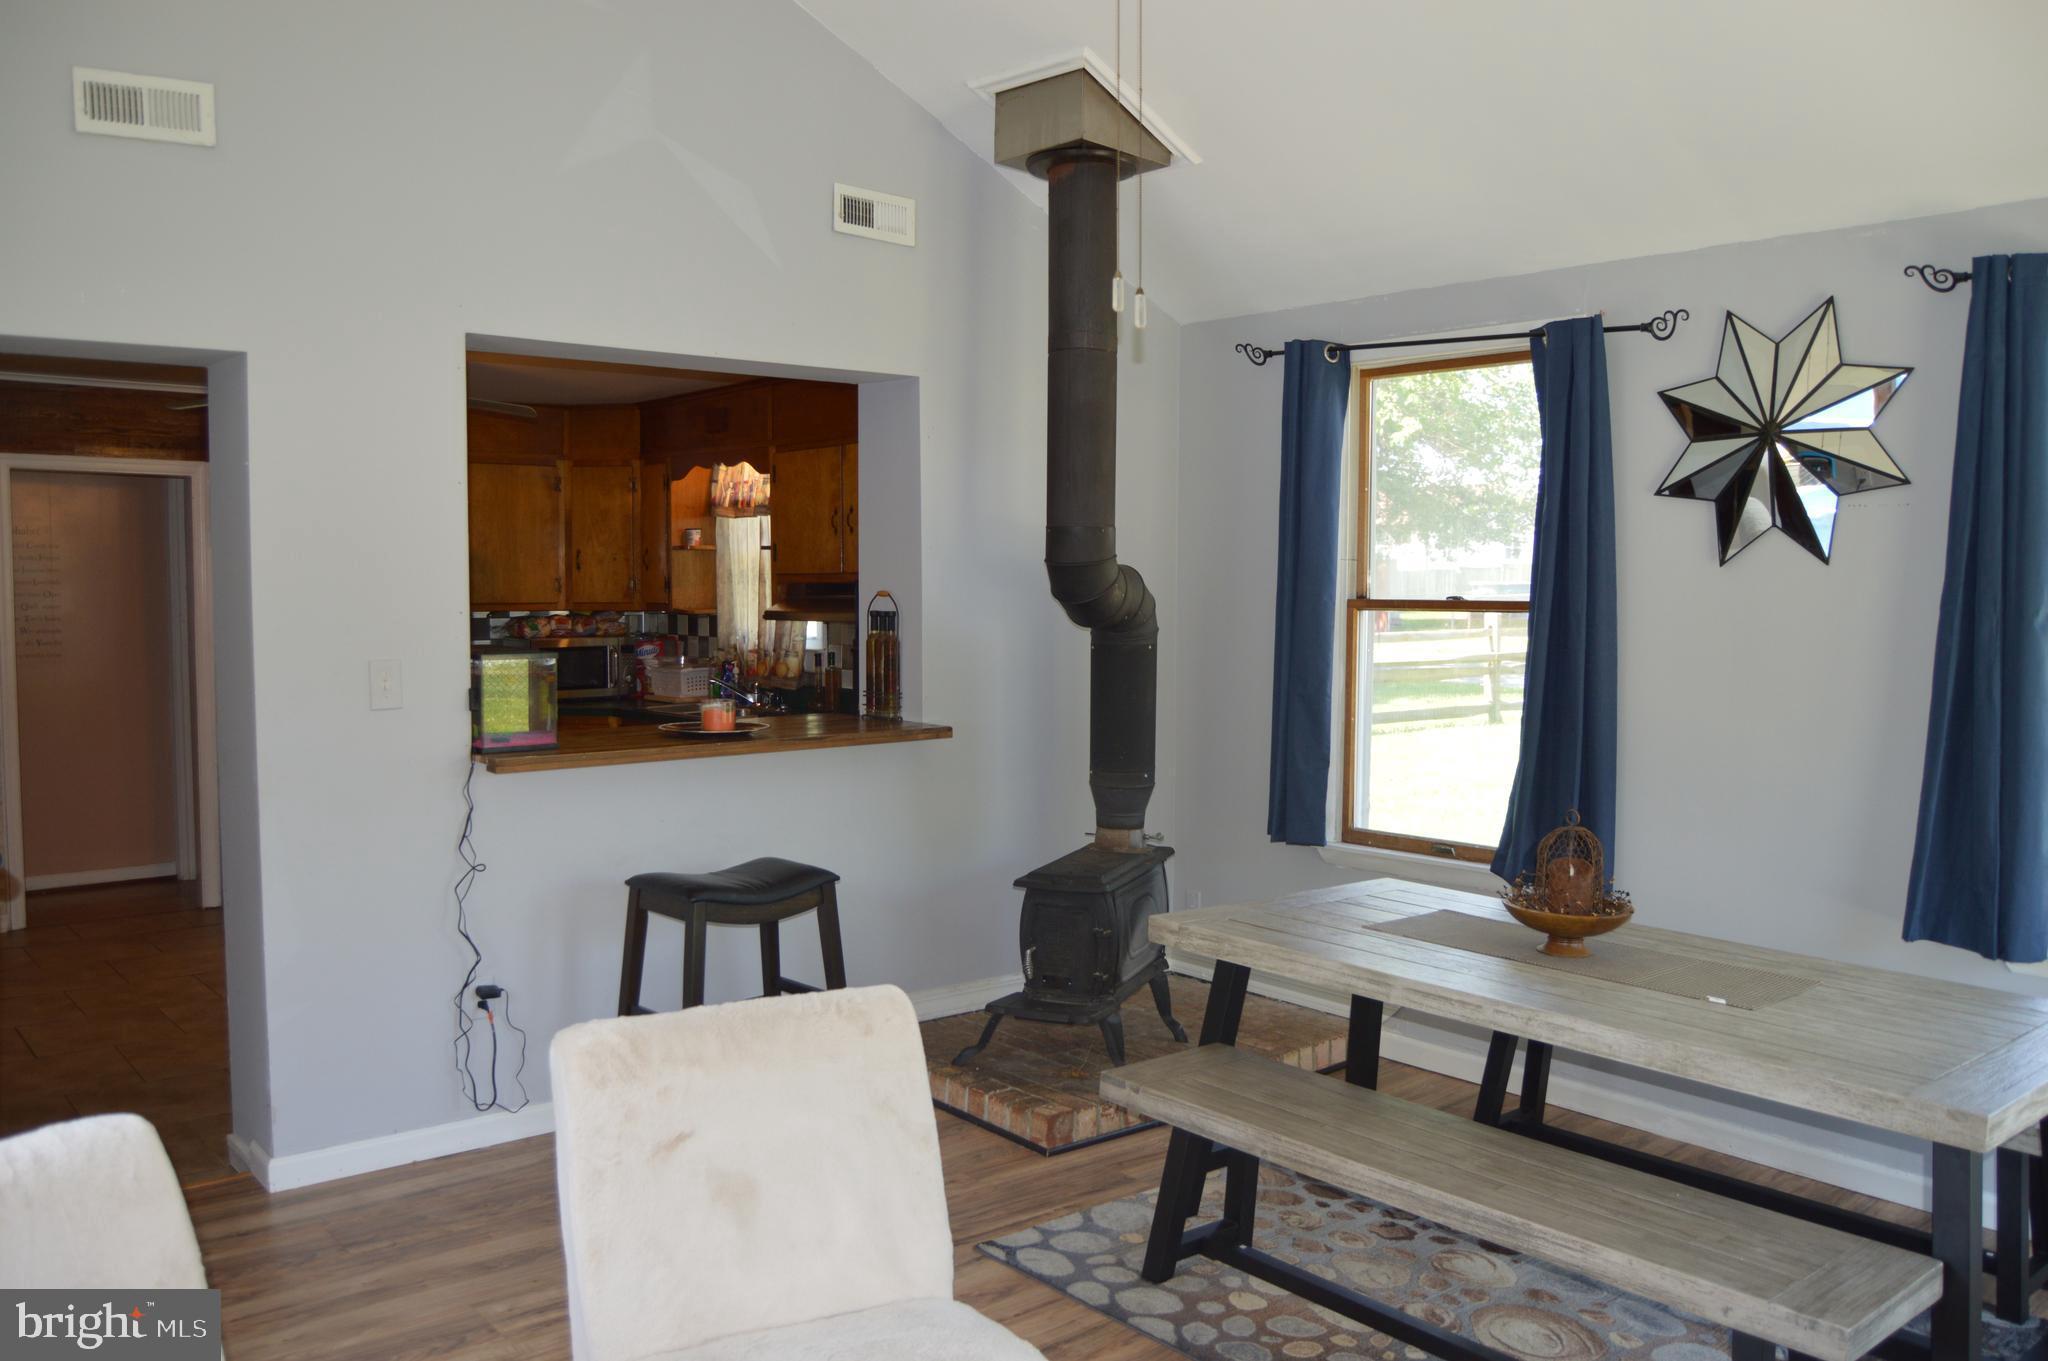 19 MELVILLE RD, Pasadena, MD 21122 Pasadena MD - MDAA399912 ... on 1700 sq ft log home, 1700 sq ft farmhouse plans, 2 story ranch home plans,